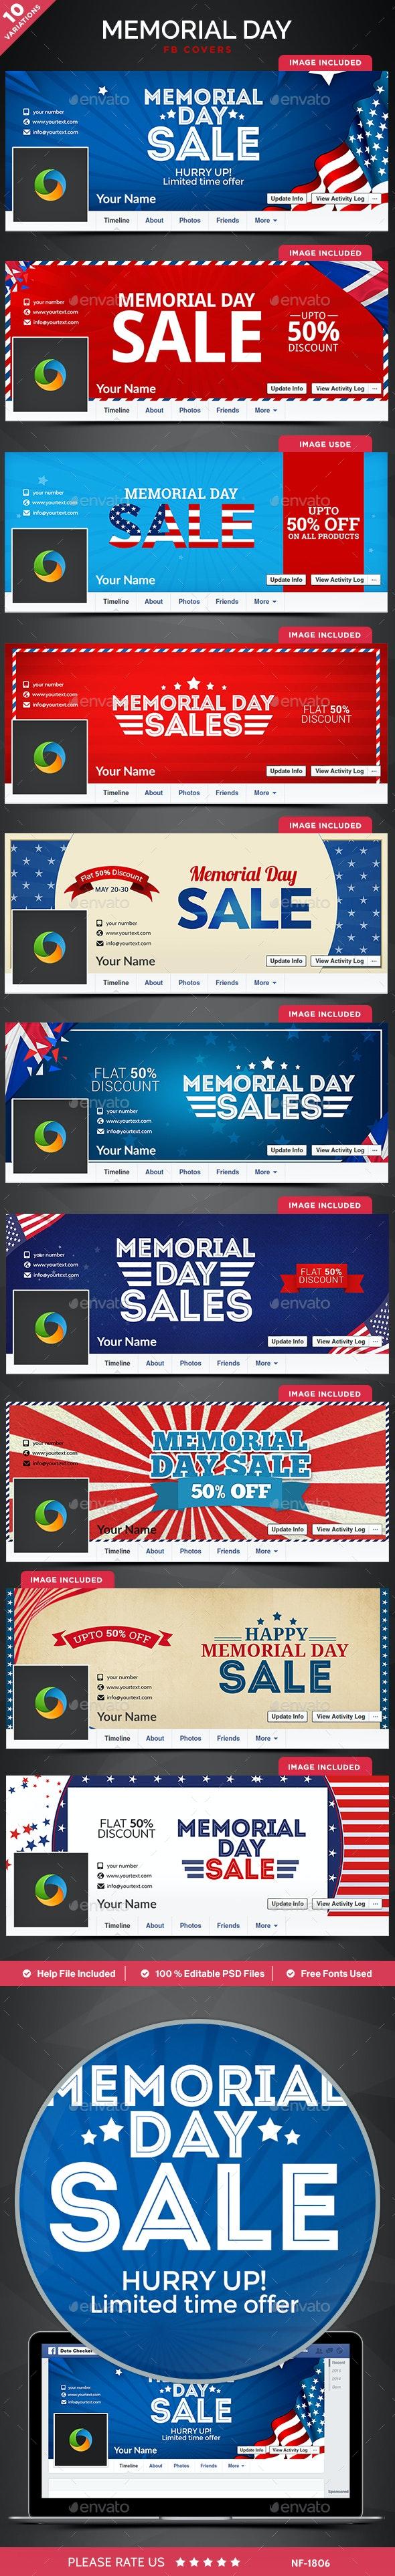 Memorial Day Facebook Covers - 10 Designs - Facebook Timeline Covers Social Media